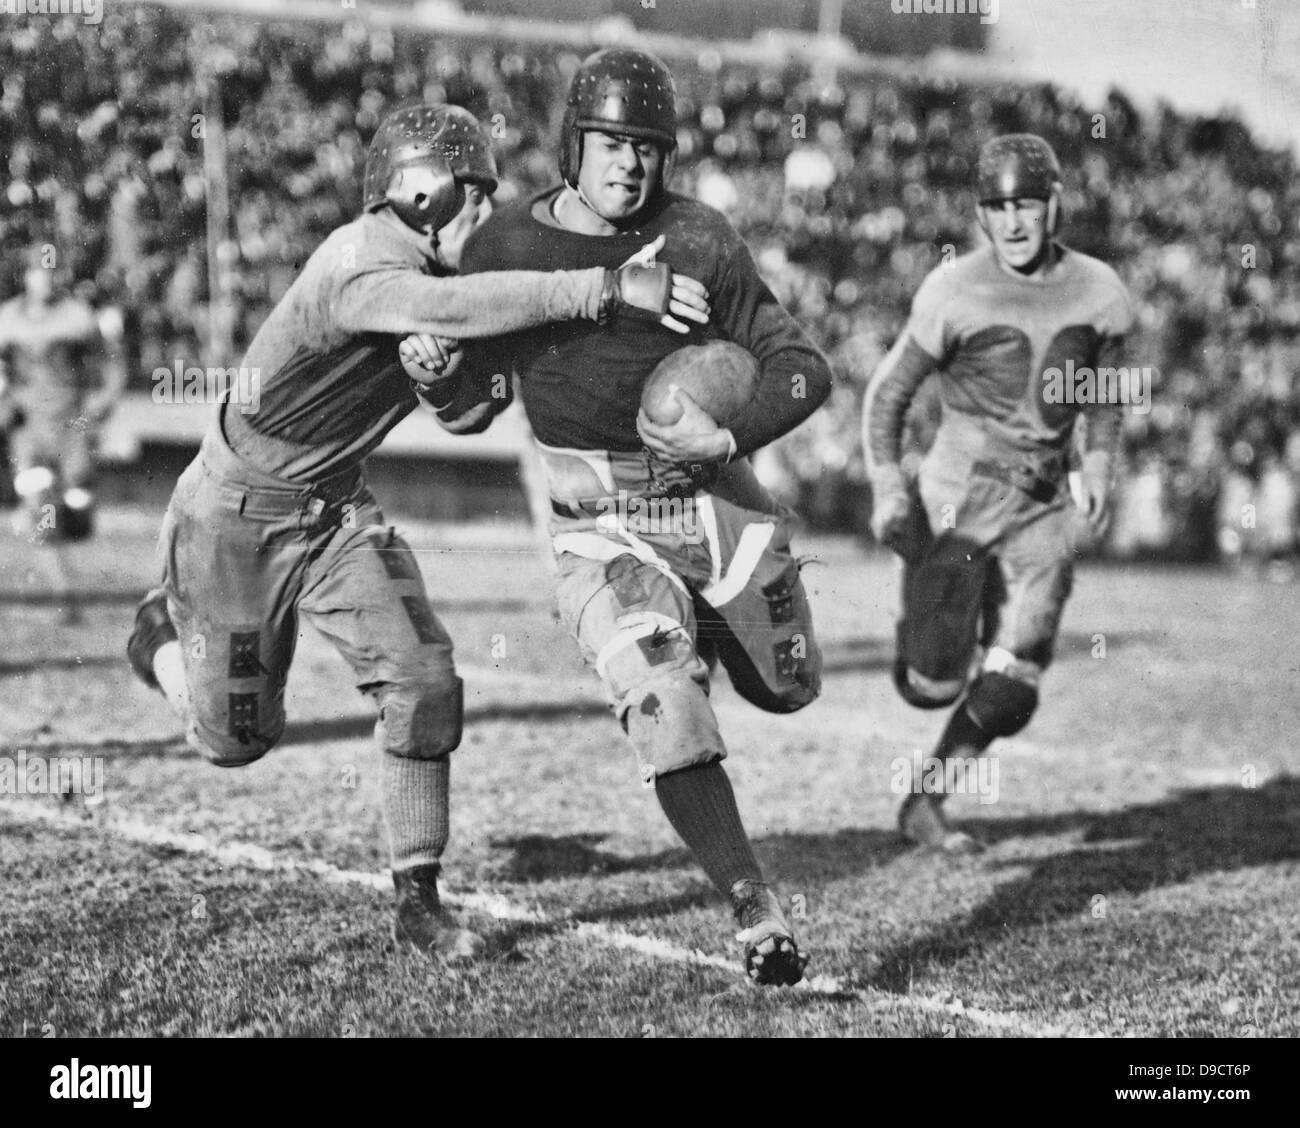 Match de football - Vintage football américain, vers 1925 Photo Stock